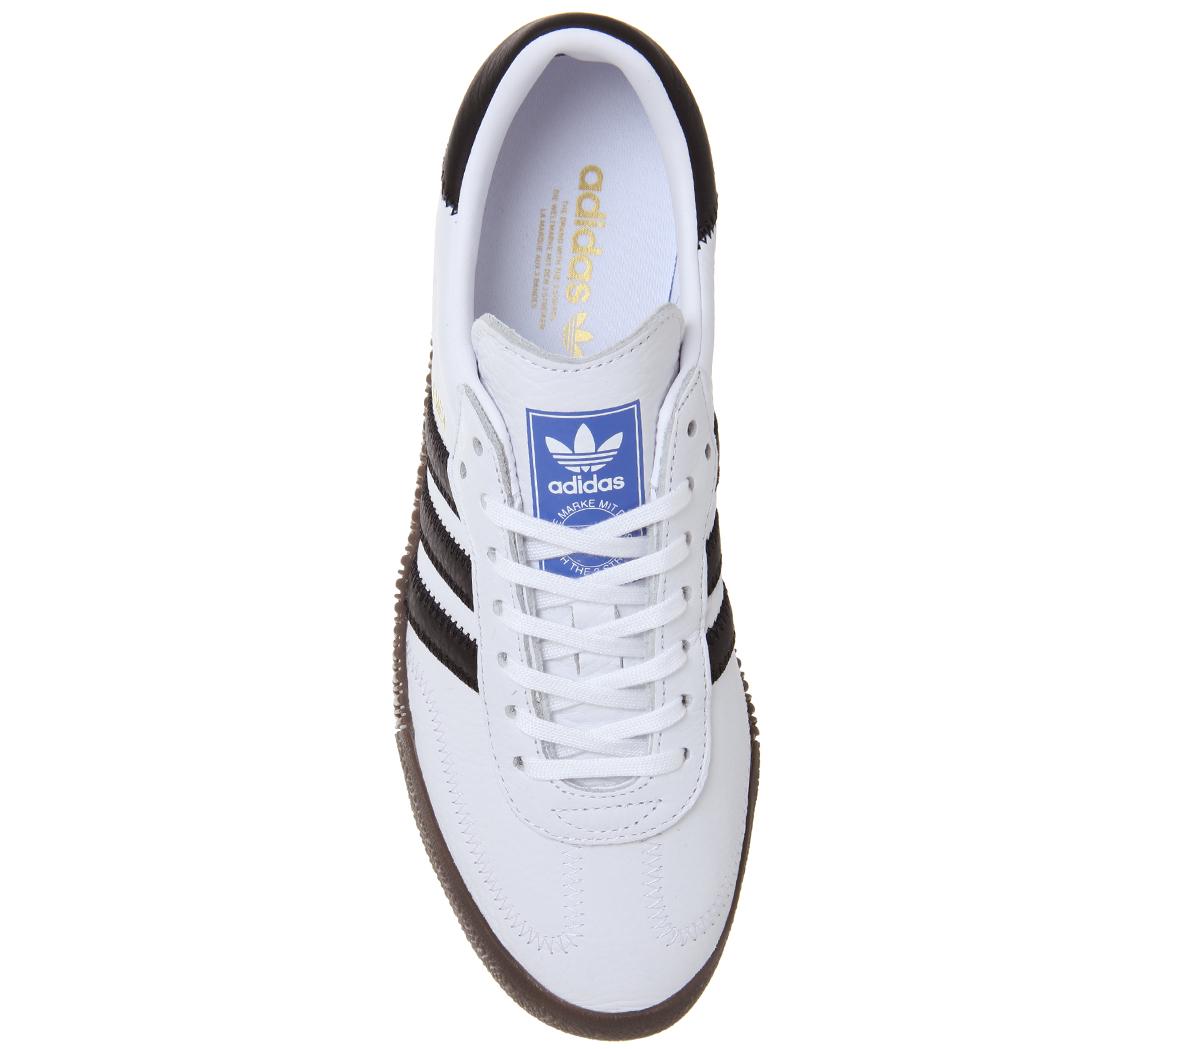 Trainers Rose Samba Gum Noir Adidas Blanc Chaussures Core Femme 6gfybvY7